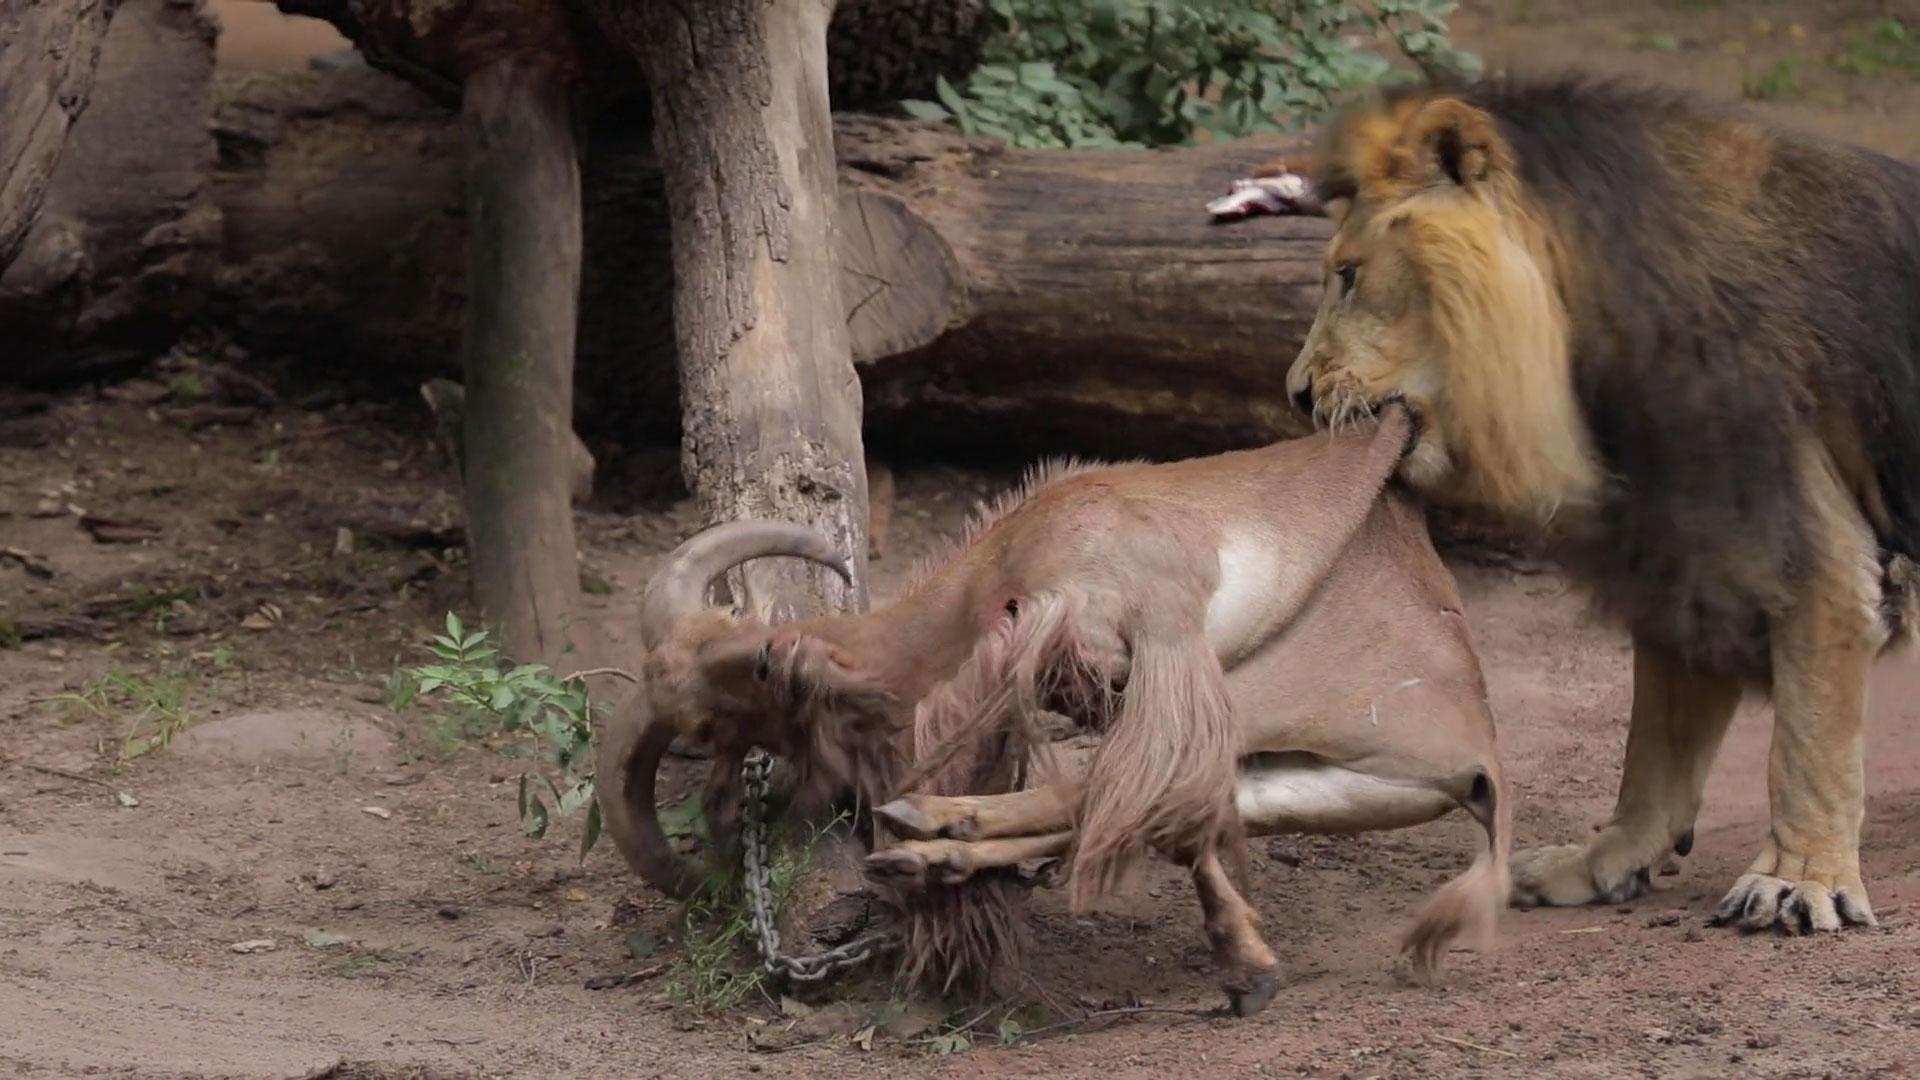 Löwe frisst Mähnenschaf im Nürnberger Zoo